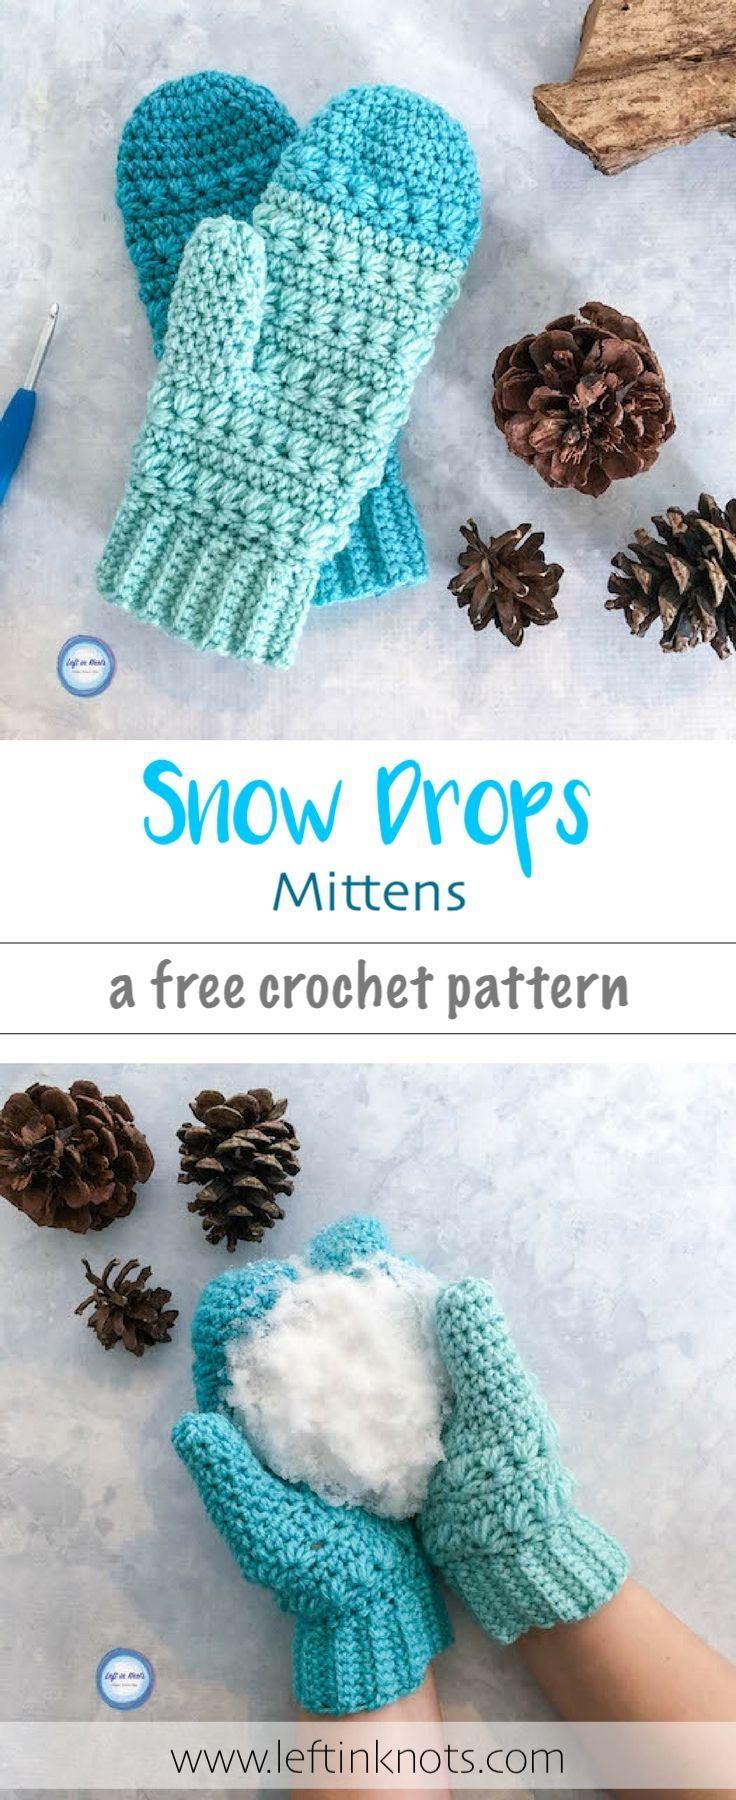 Snow Drops Mittens Free Crochet Pattern | Tejido, Guantes y Bordado